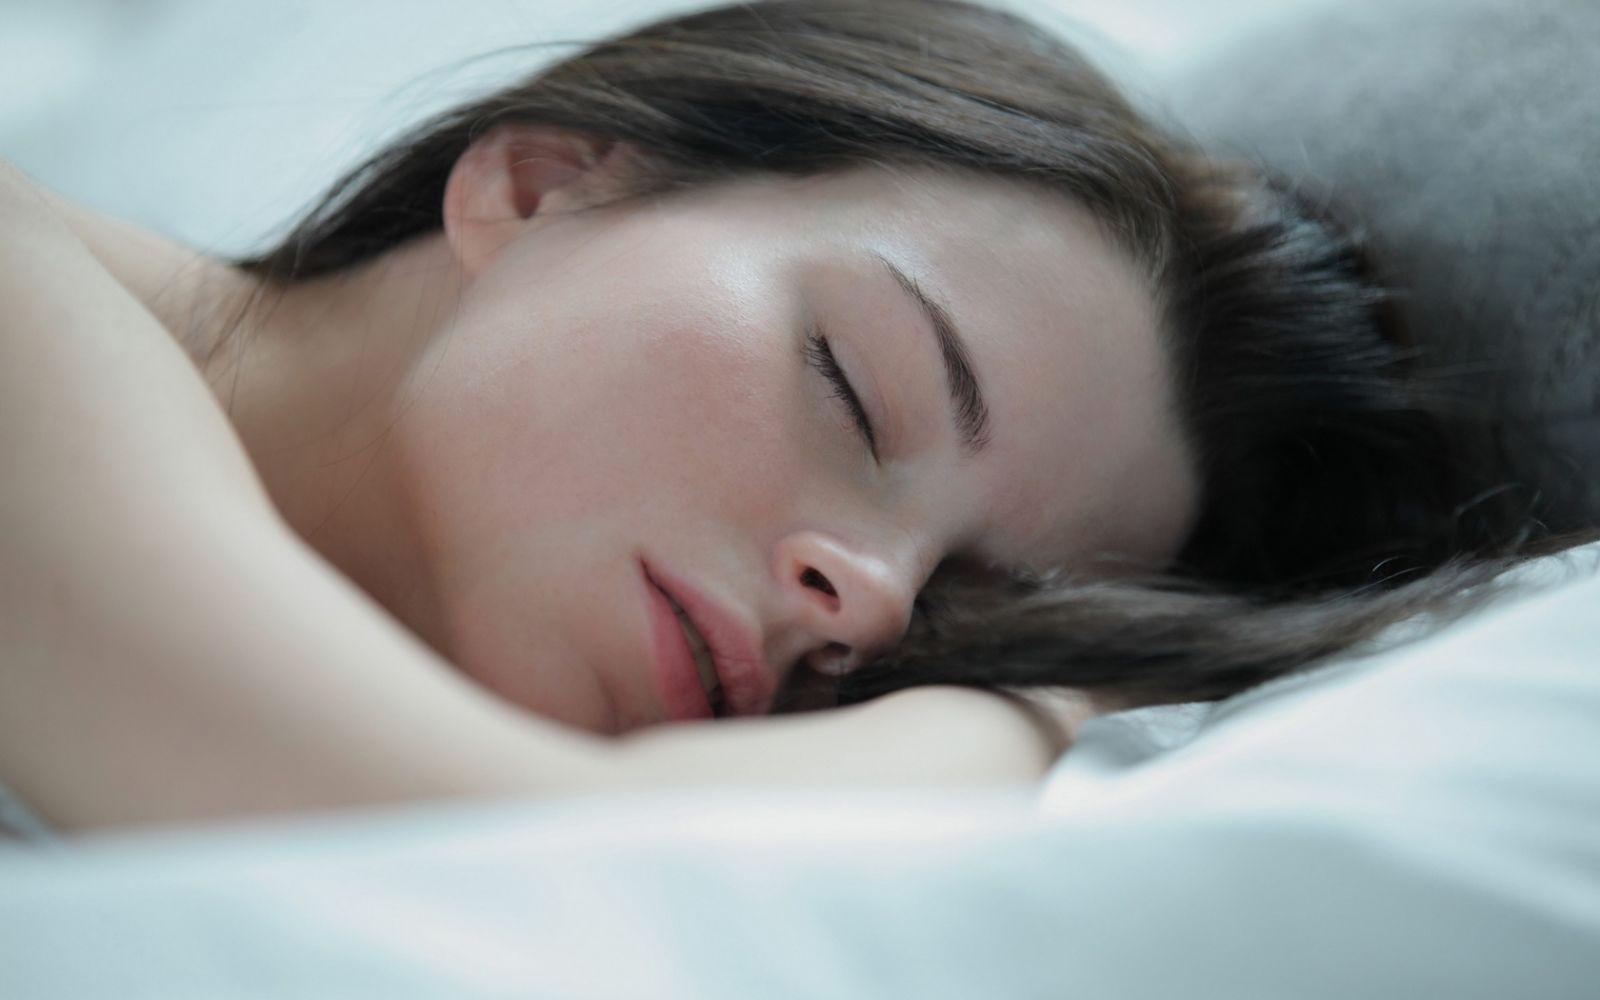 nude-teen-girl-sleeping-pictures